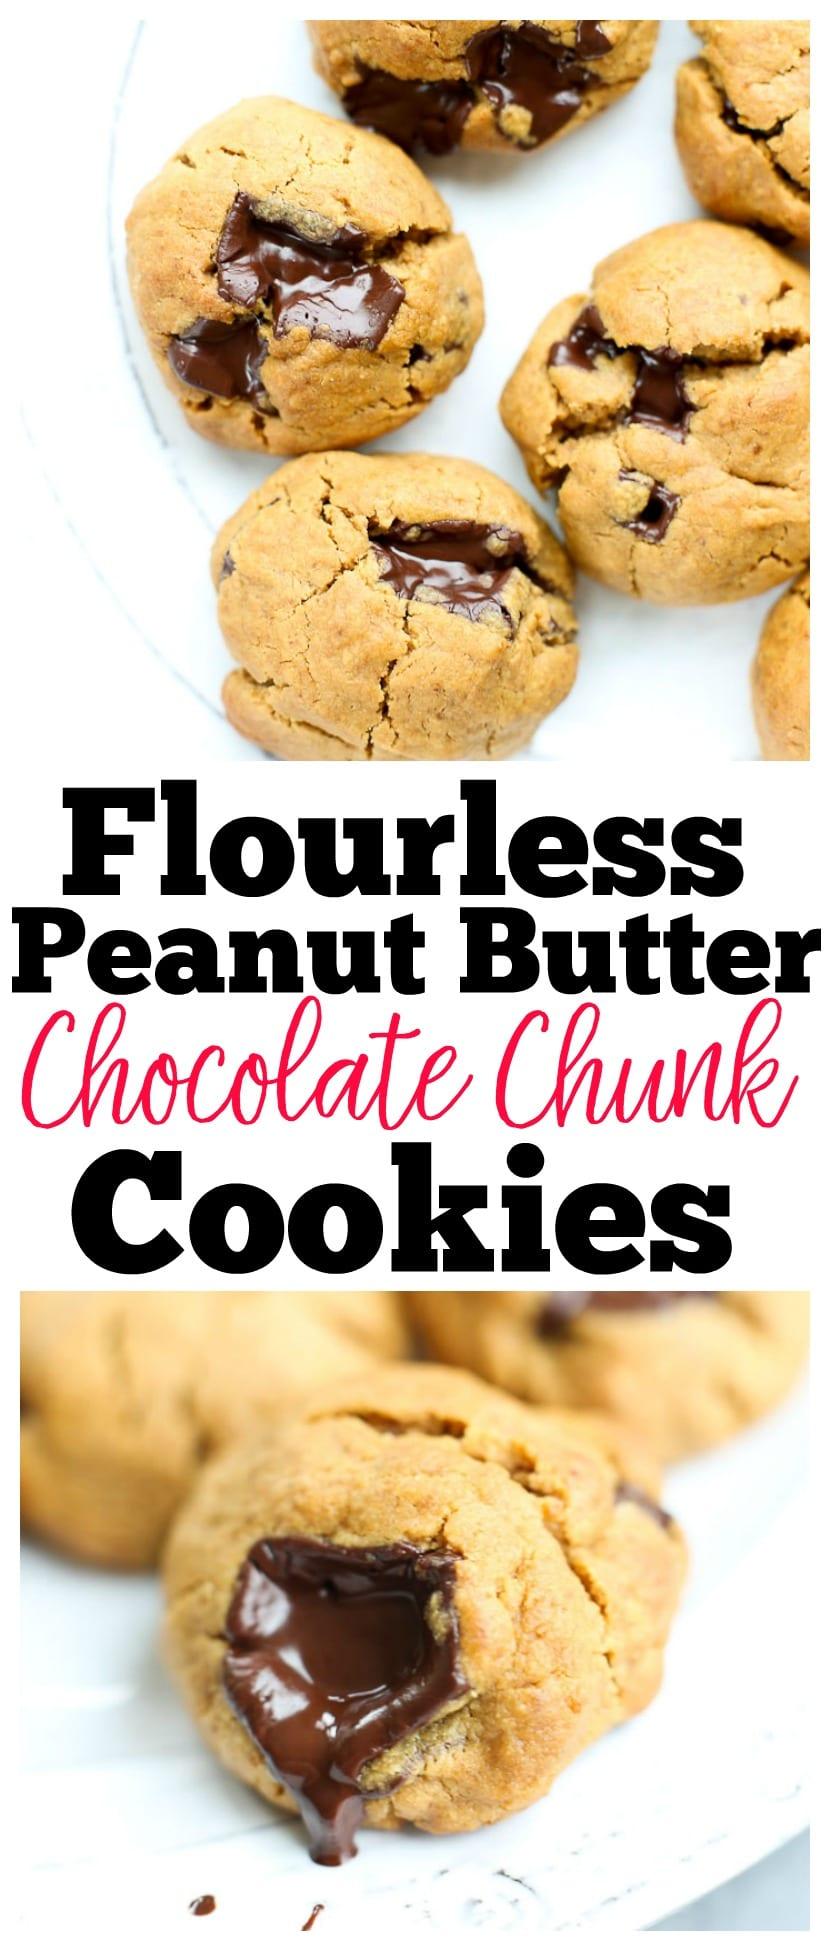 Flourless Peanut Butter Chocolate Chip Cookies Recipe | healthy cookies | gluten-free cookies |flourless cookies | dairy free |